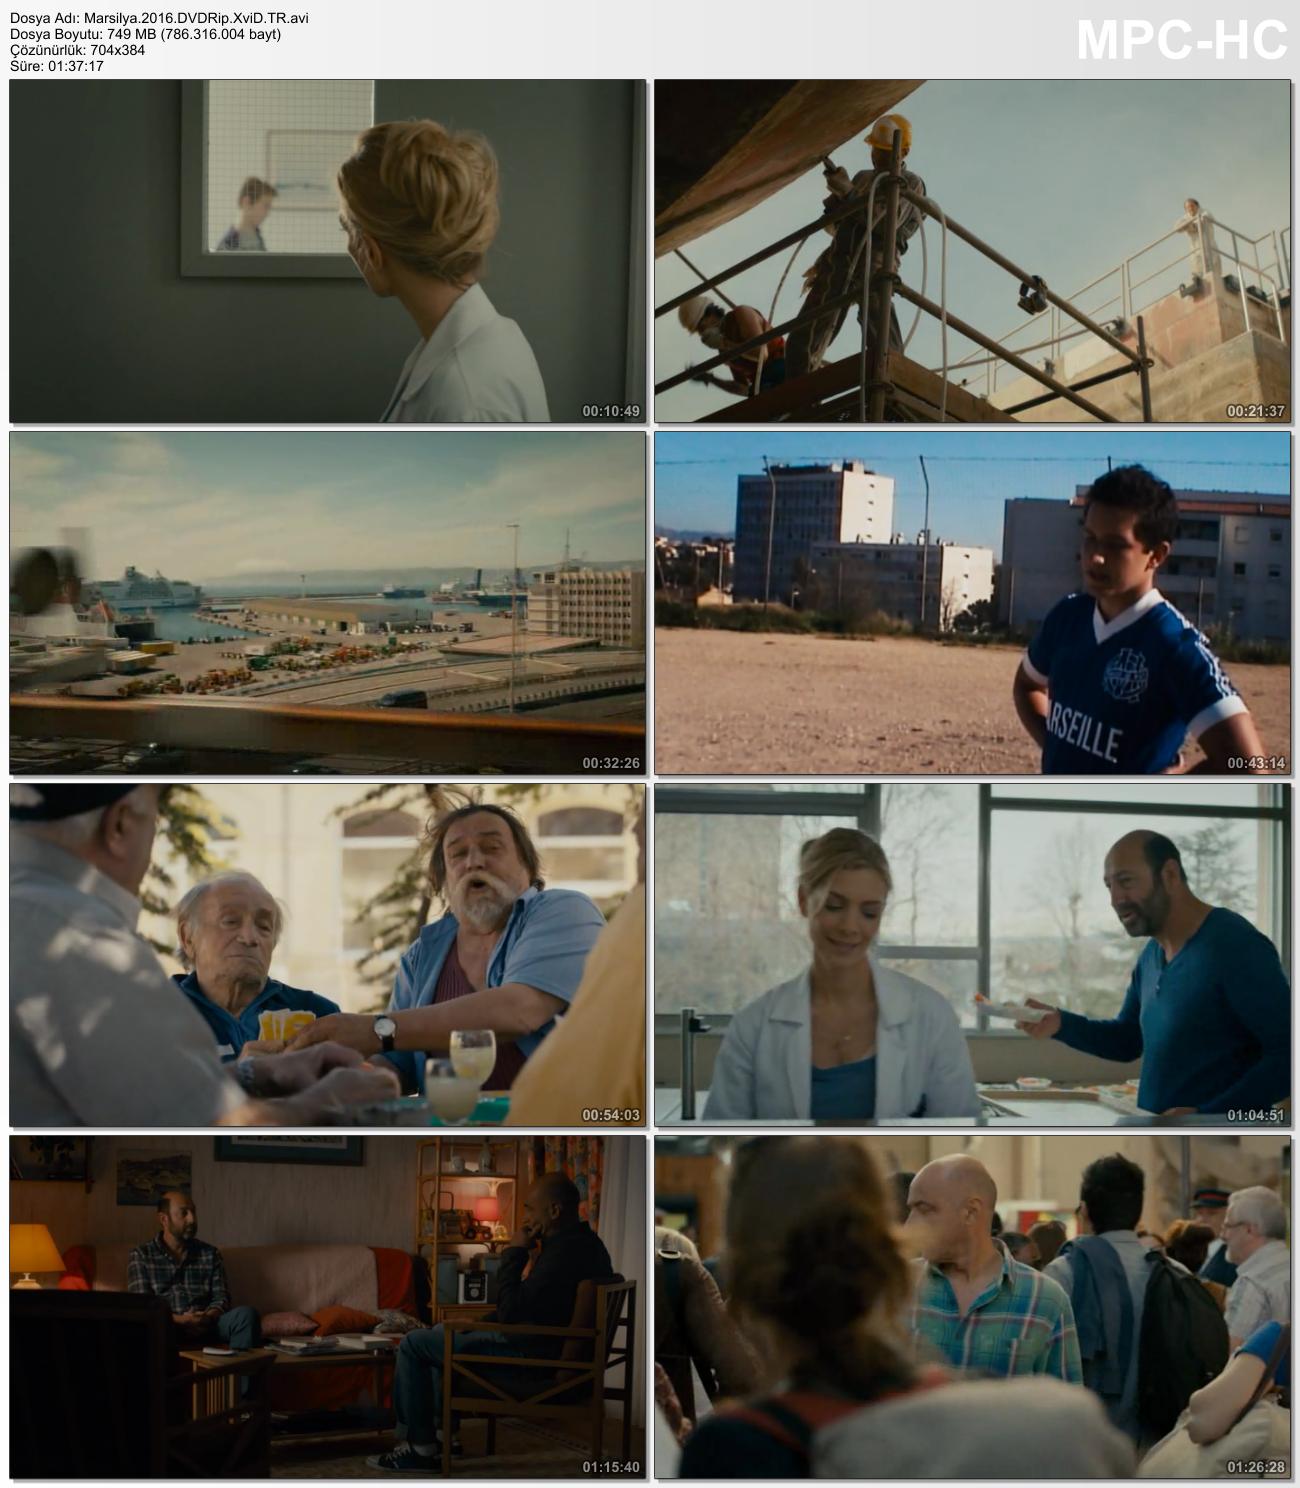 Marsilya - Marseille 2016 (Türkçe Dublaj) DVDRip XviD